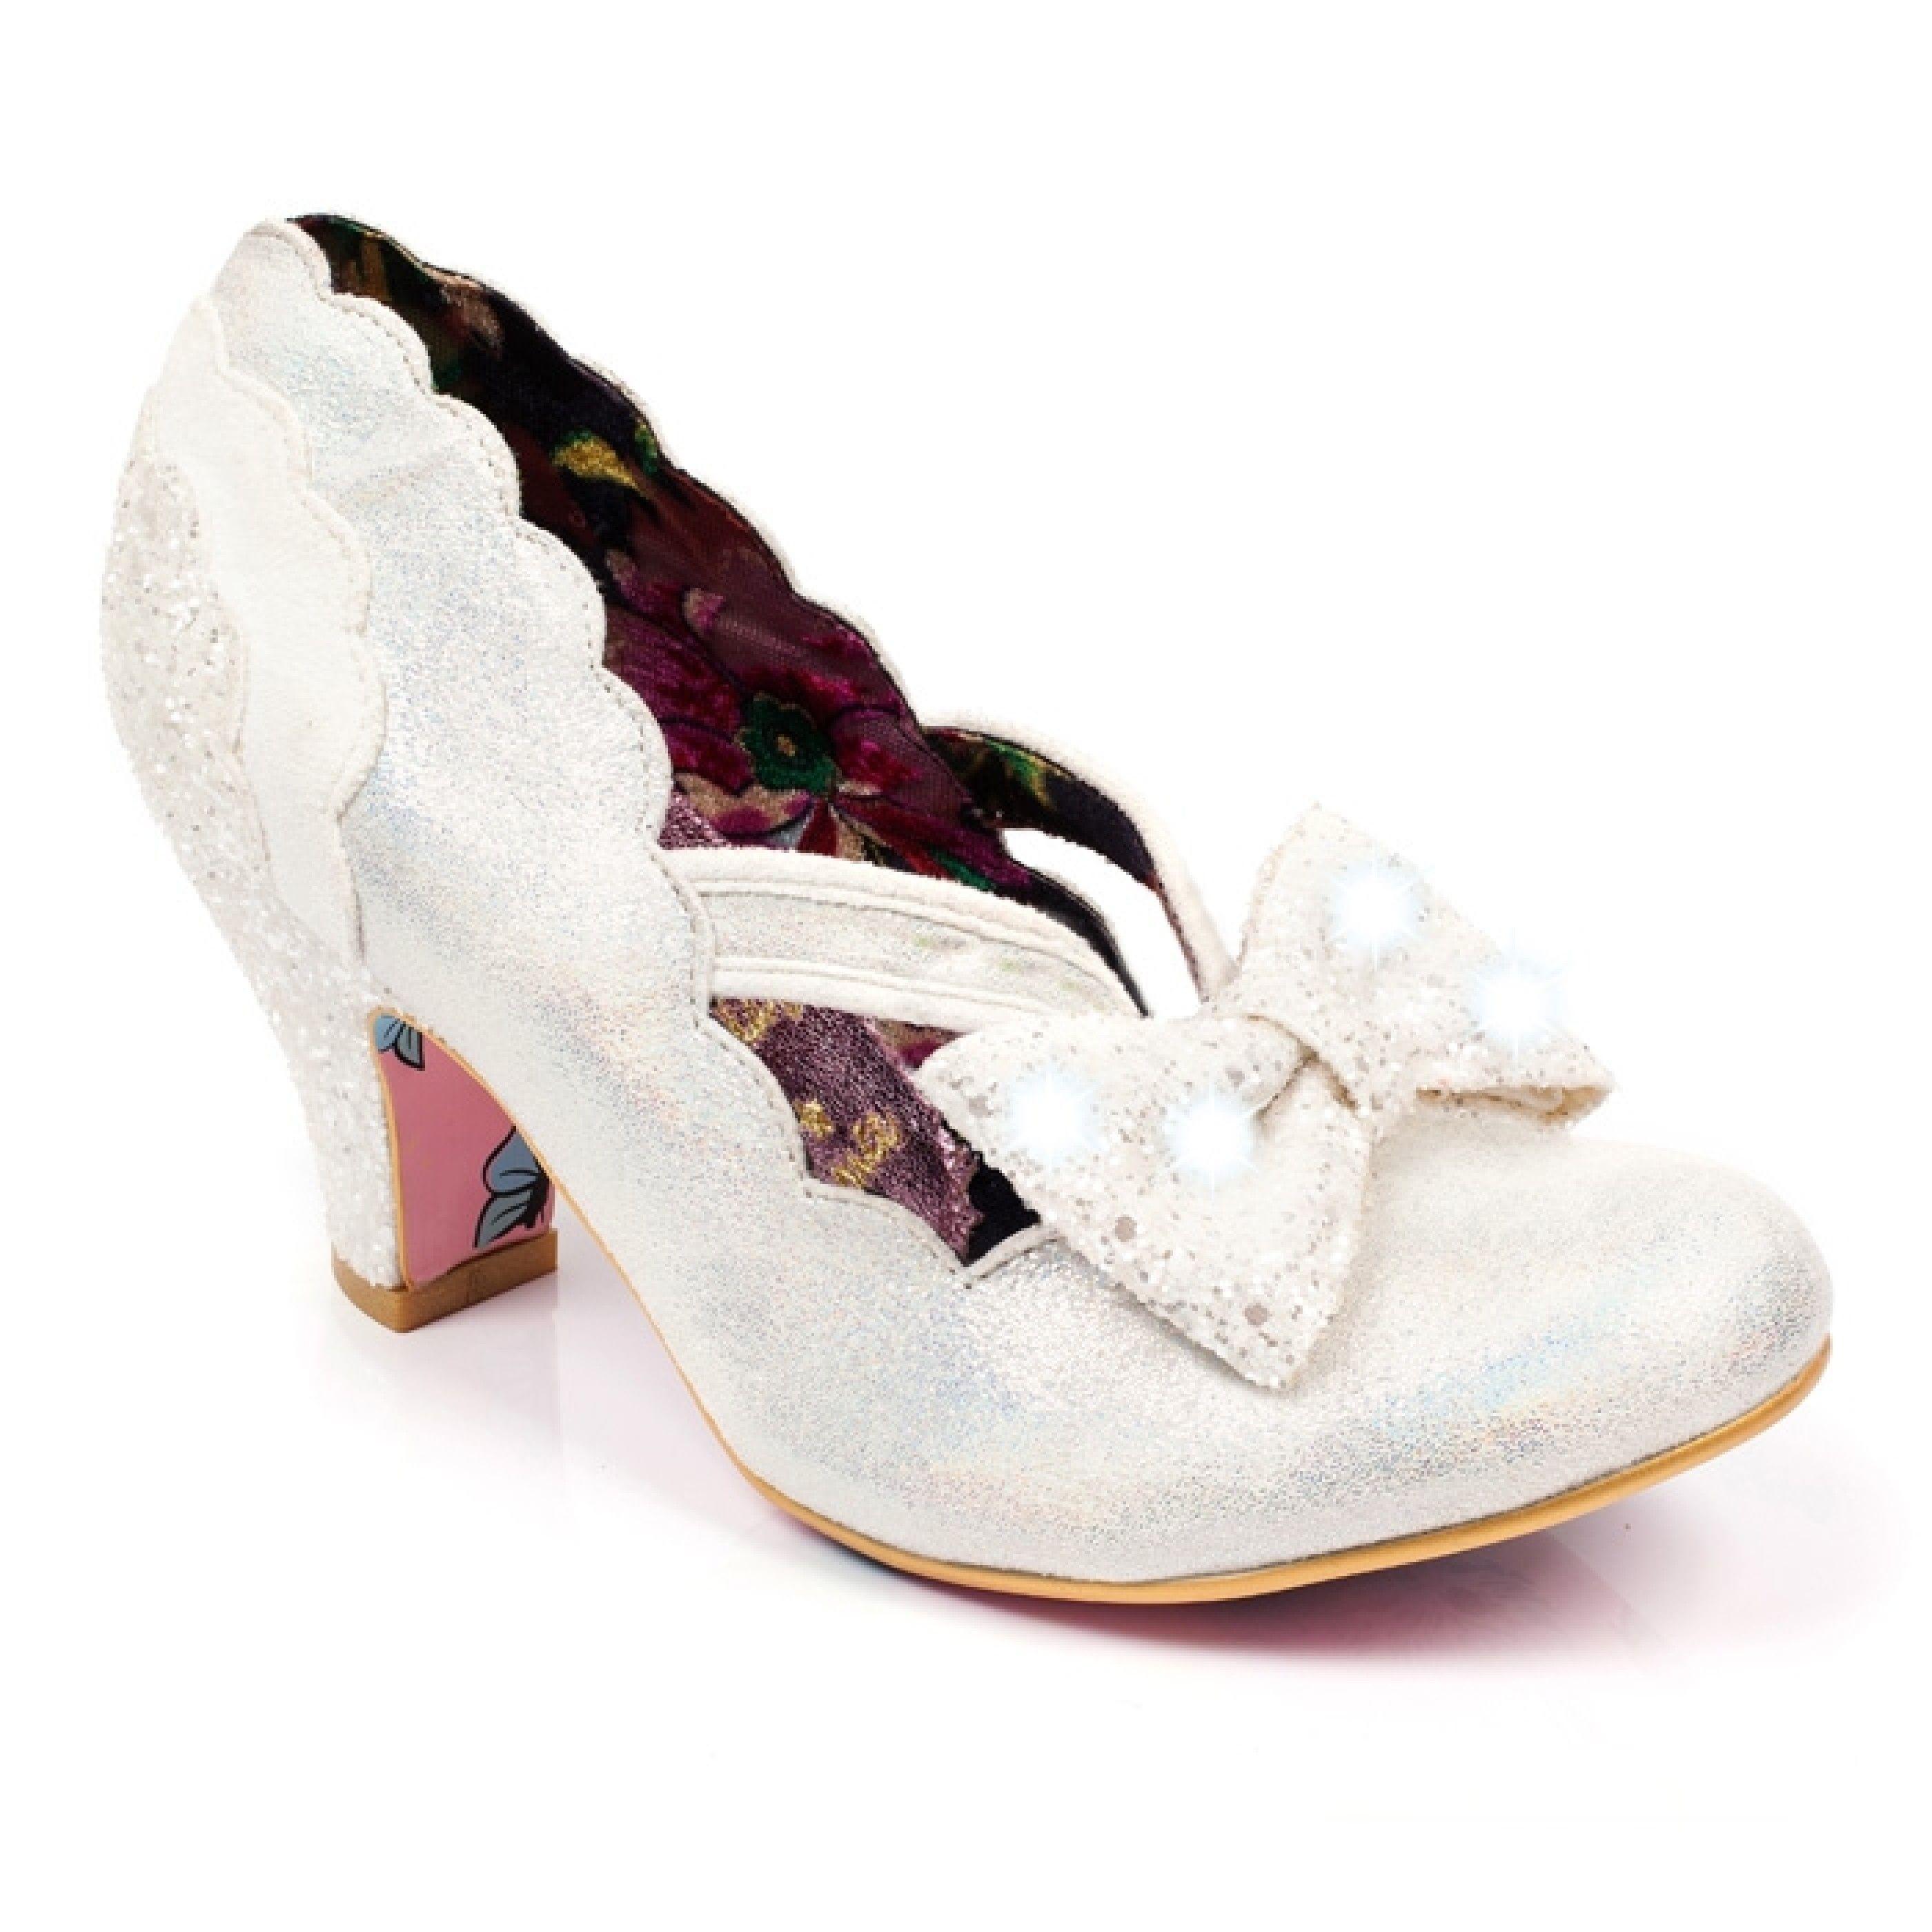 06e61a4b888 ☆ Irregular Choice - Twinkle Heels (in White) ☆